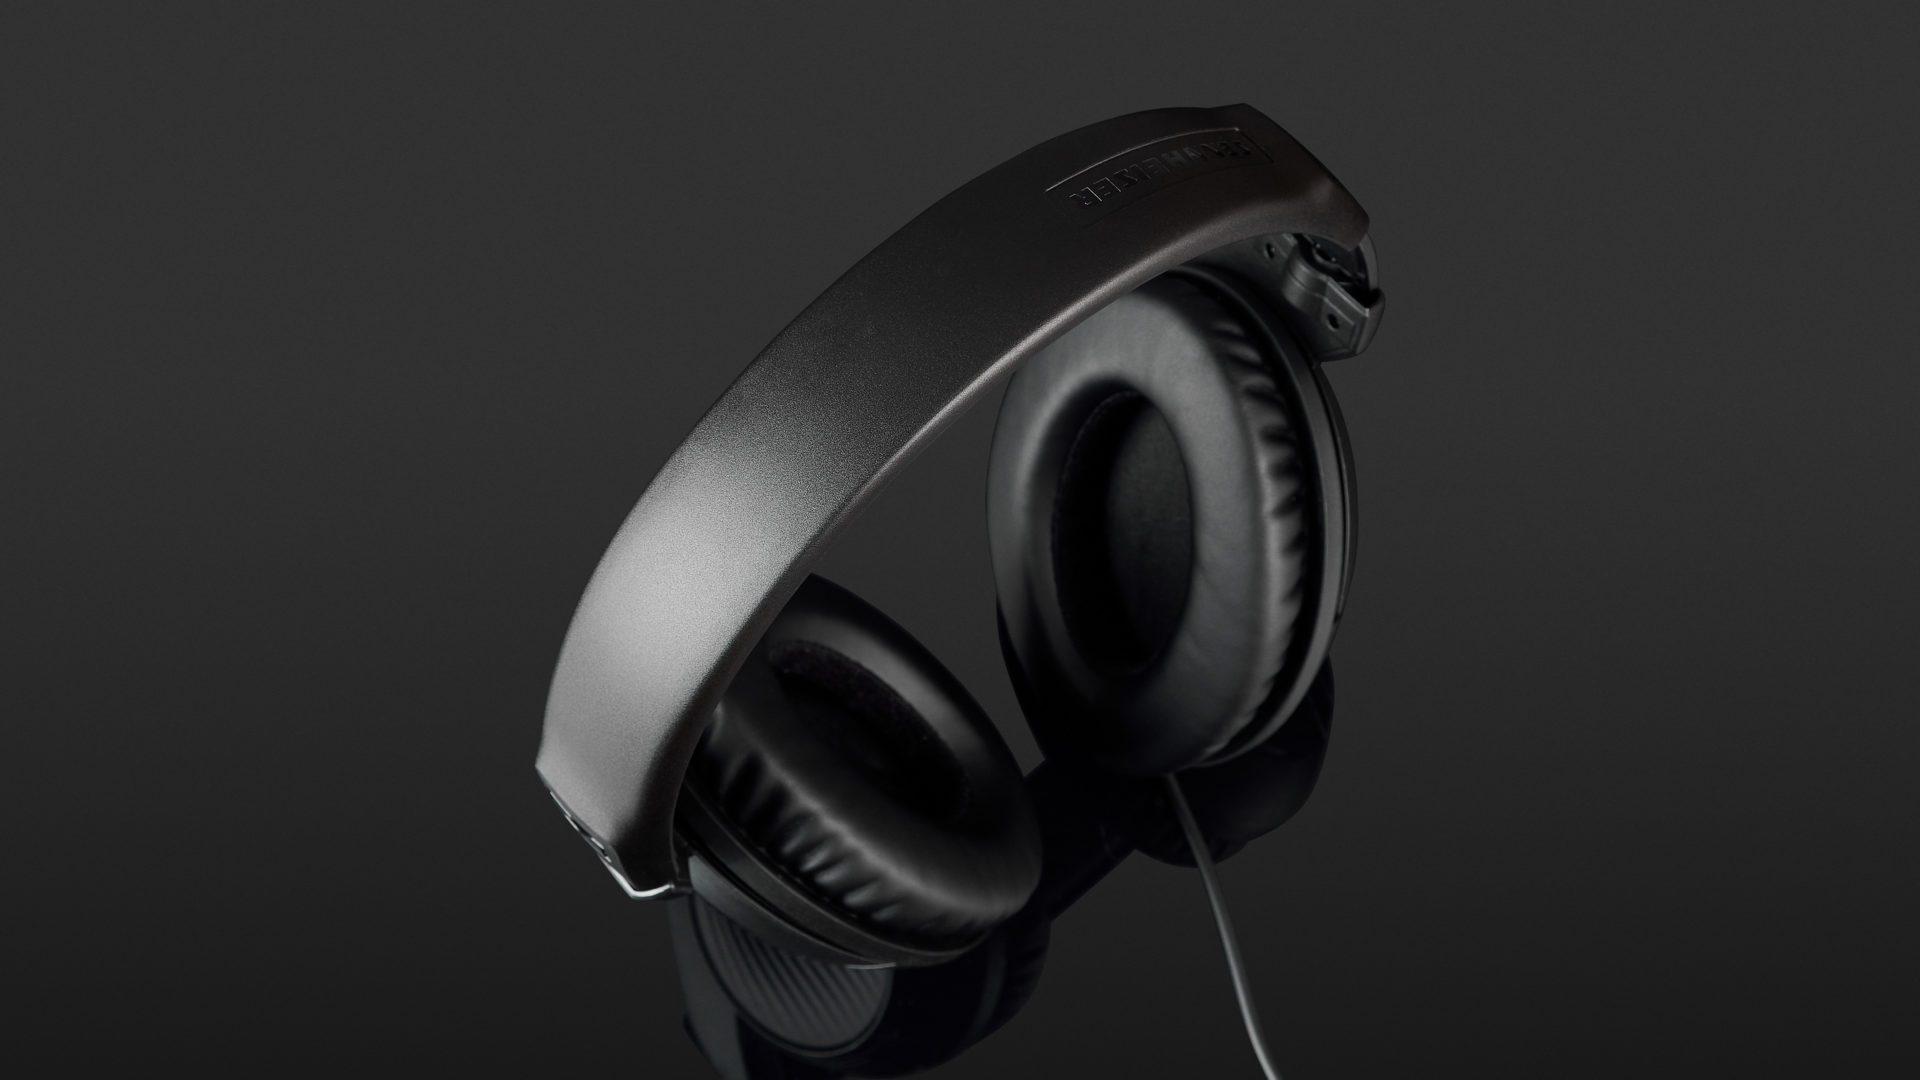 Sennheiser HD 200 Pro Review | headphonecheck.com